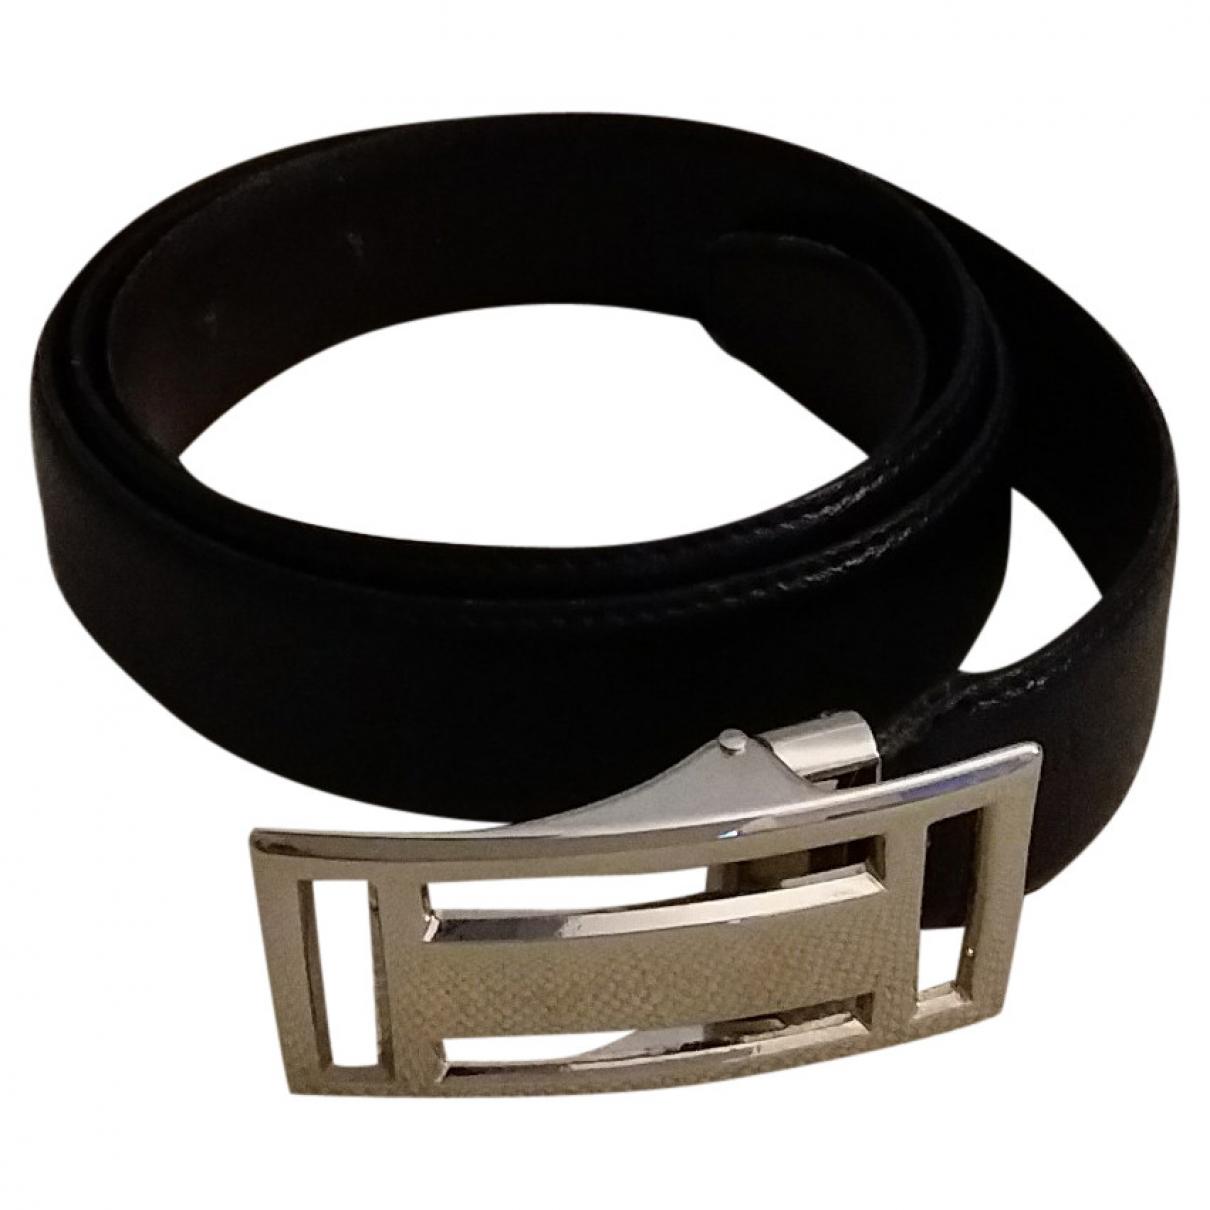 Cinturon de Charol Charles Jourdan